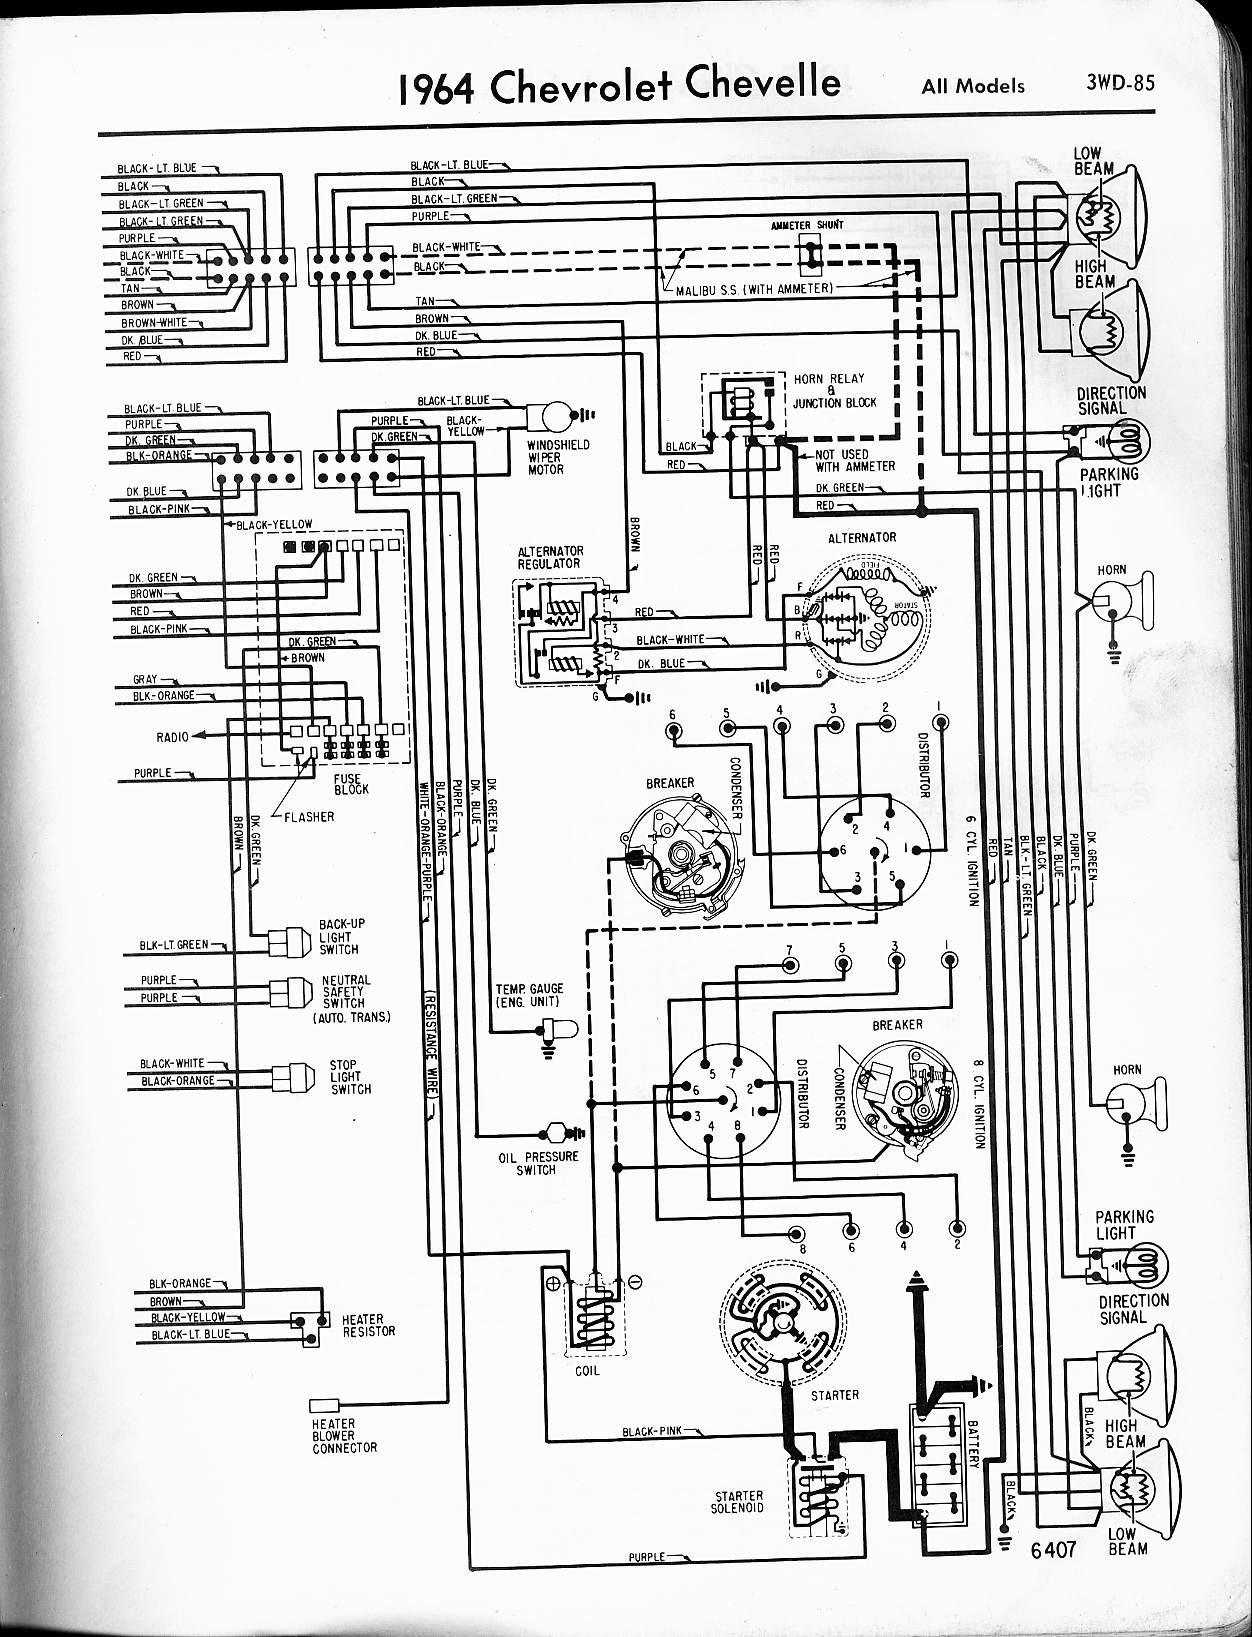 GV_9123] 98 Chevy Malibu Engine Diagram Schematic Wiring